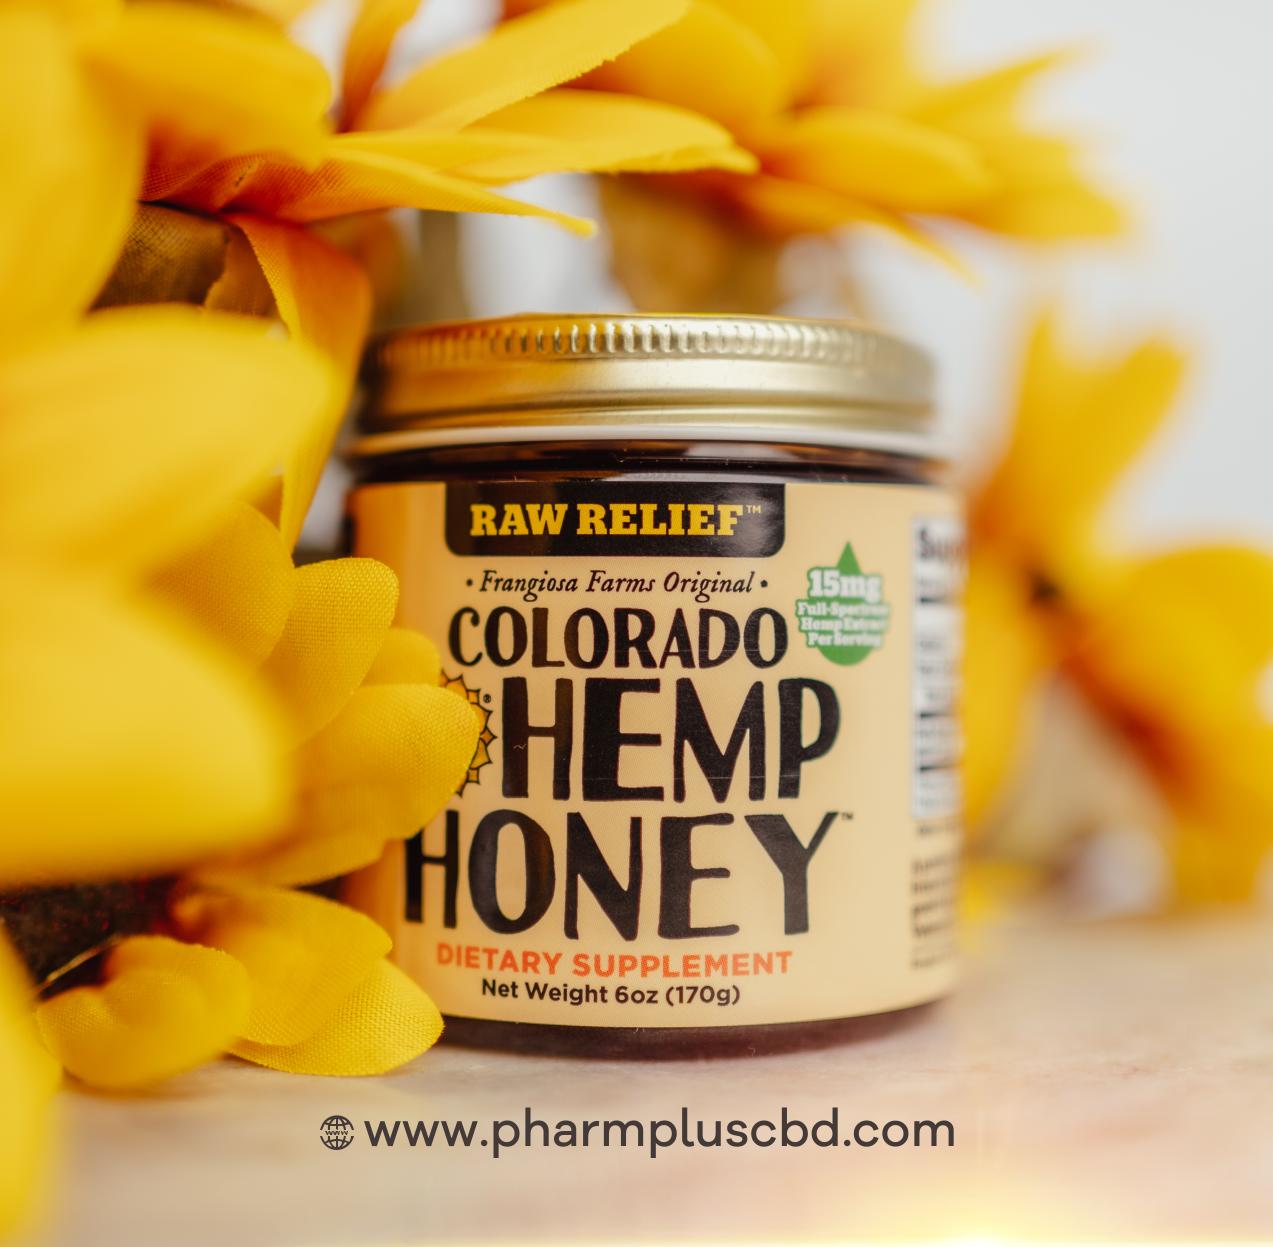 Colorado Hemp Honey Raw Relief 6oz Jar